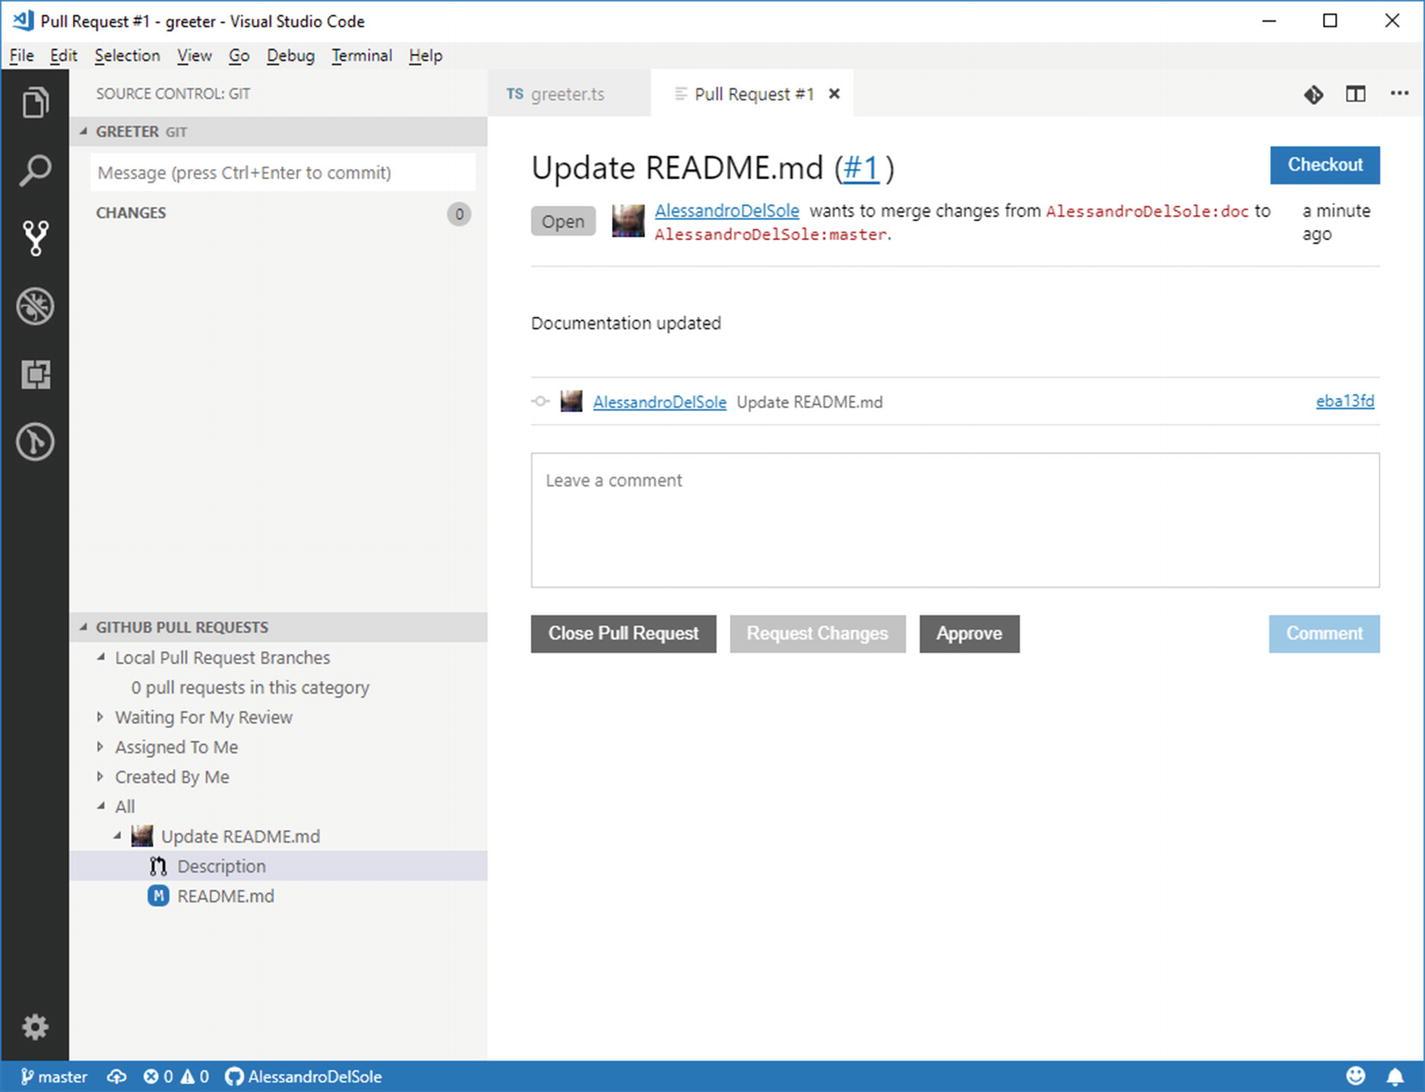 Source Control with Git   SpringerLink